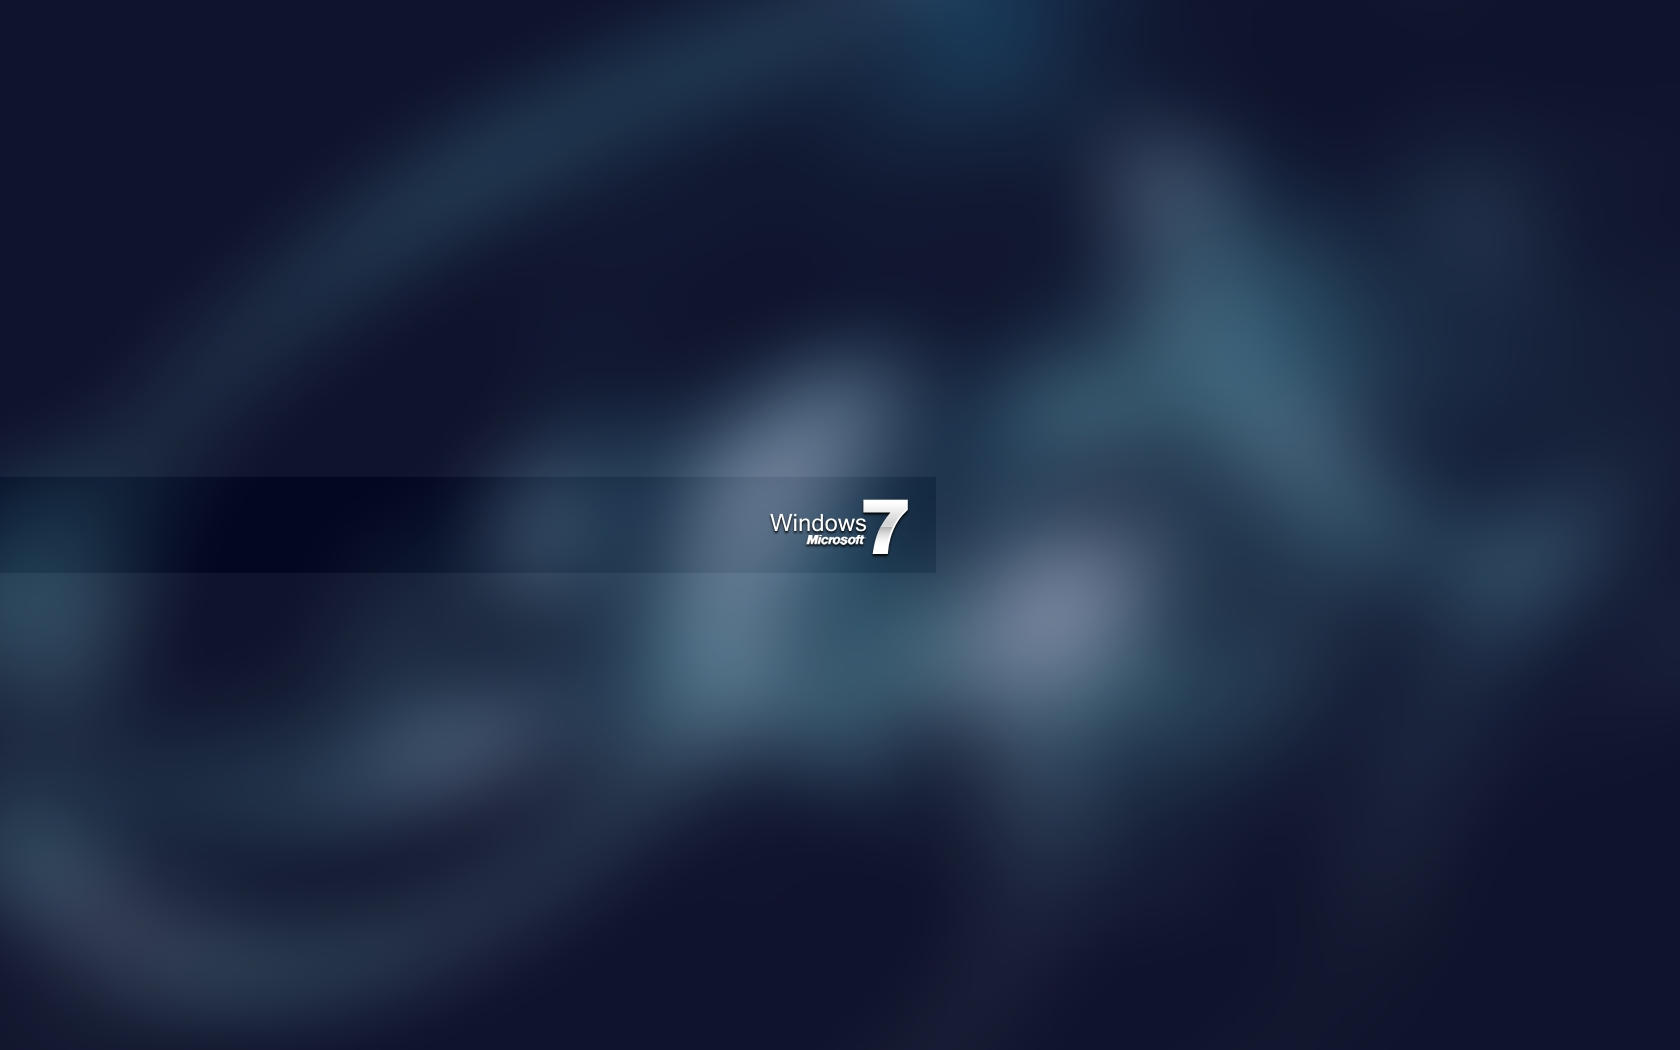 Windows SEVEN by havocki